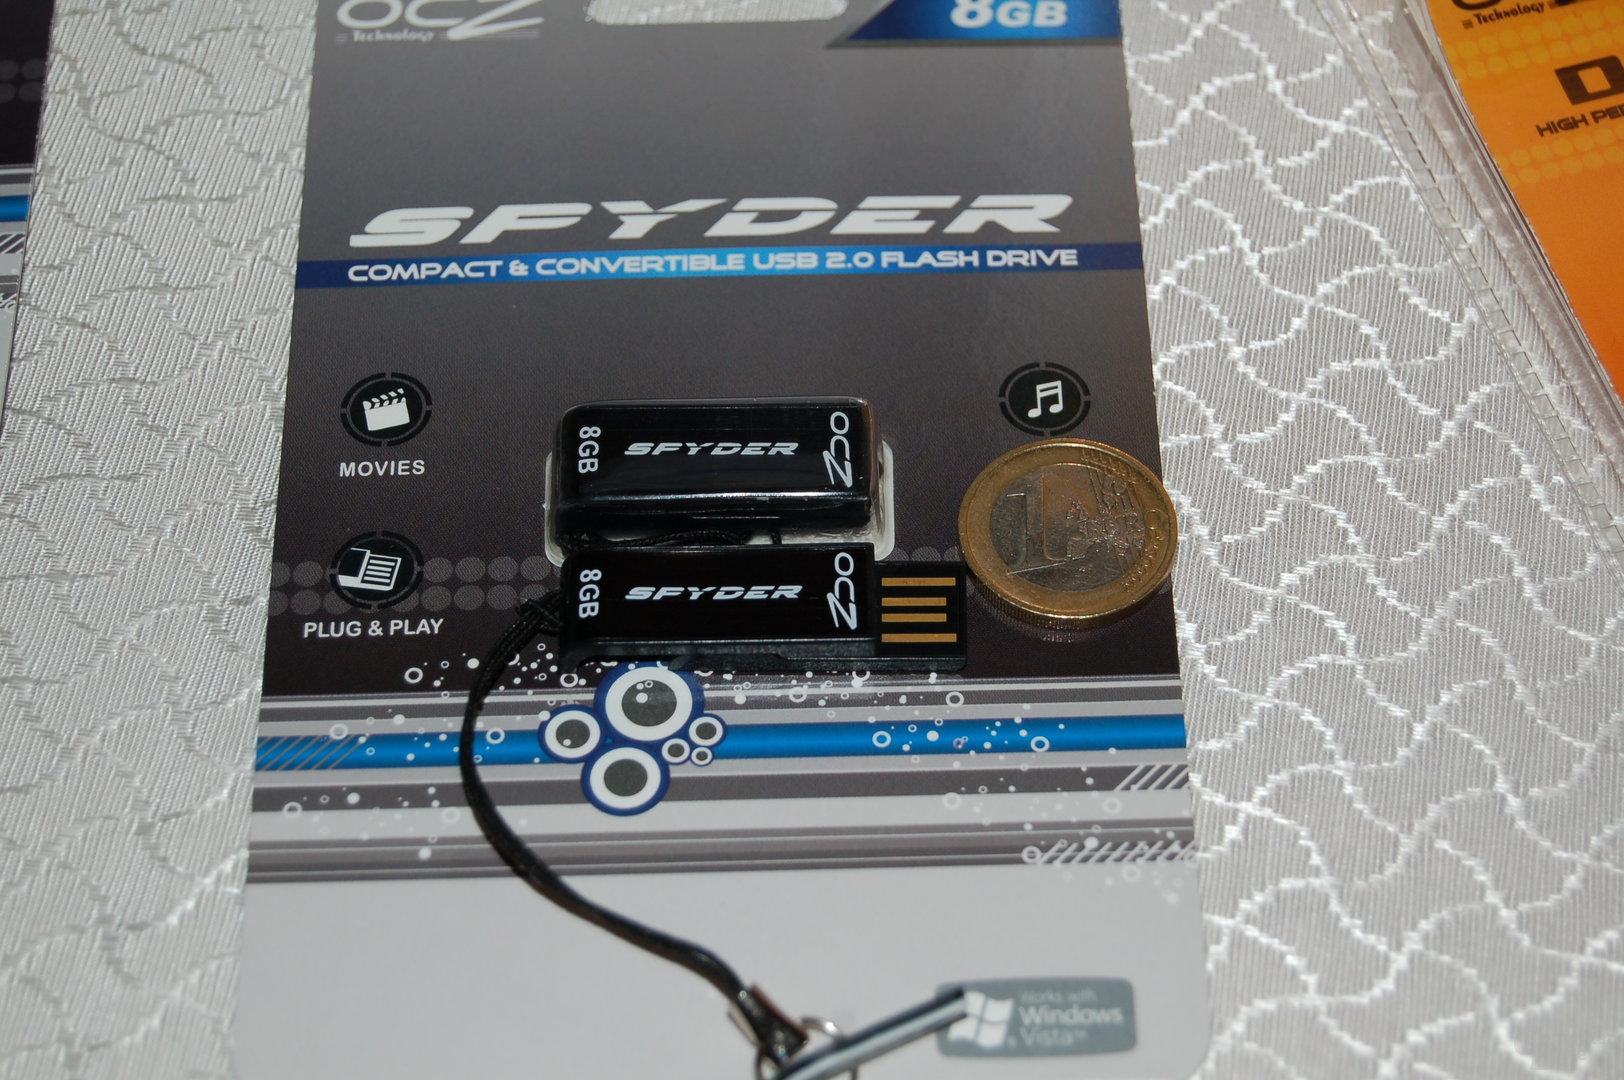 OCZ Spyder